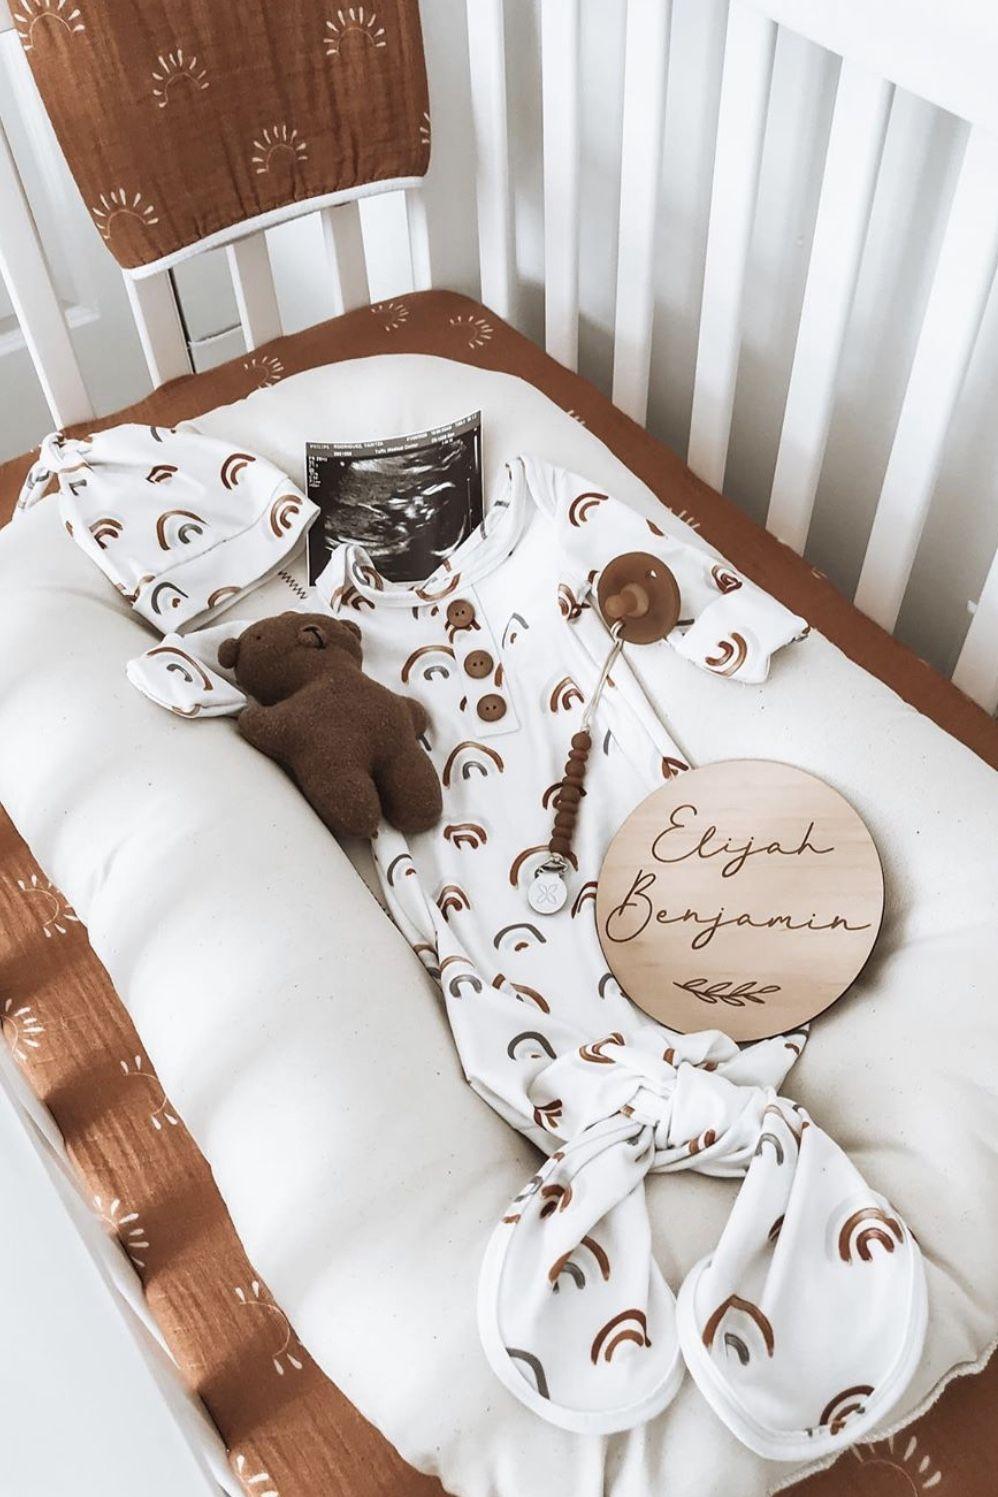 Sundown Crib Sheets In 2020 Organic Baby Clothes Baby Shower Gifts Crib Sheets